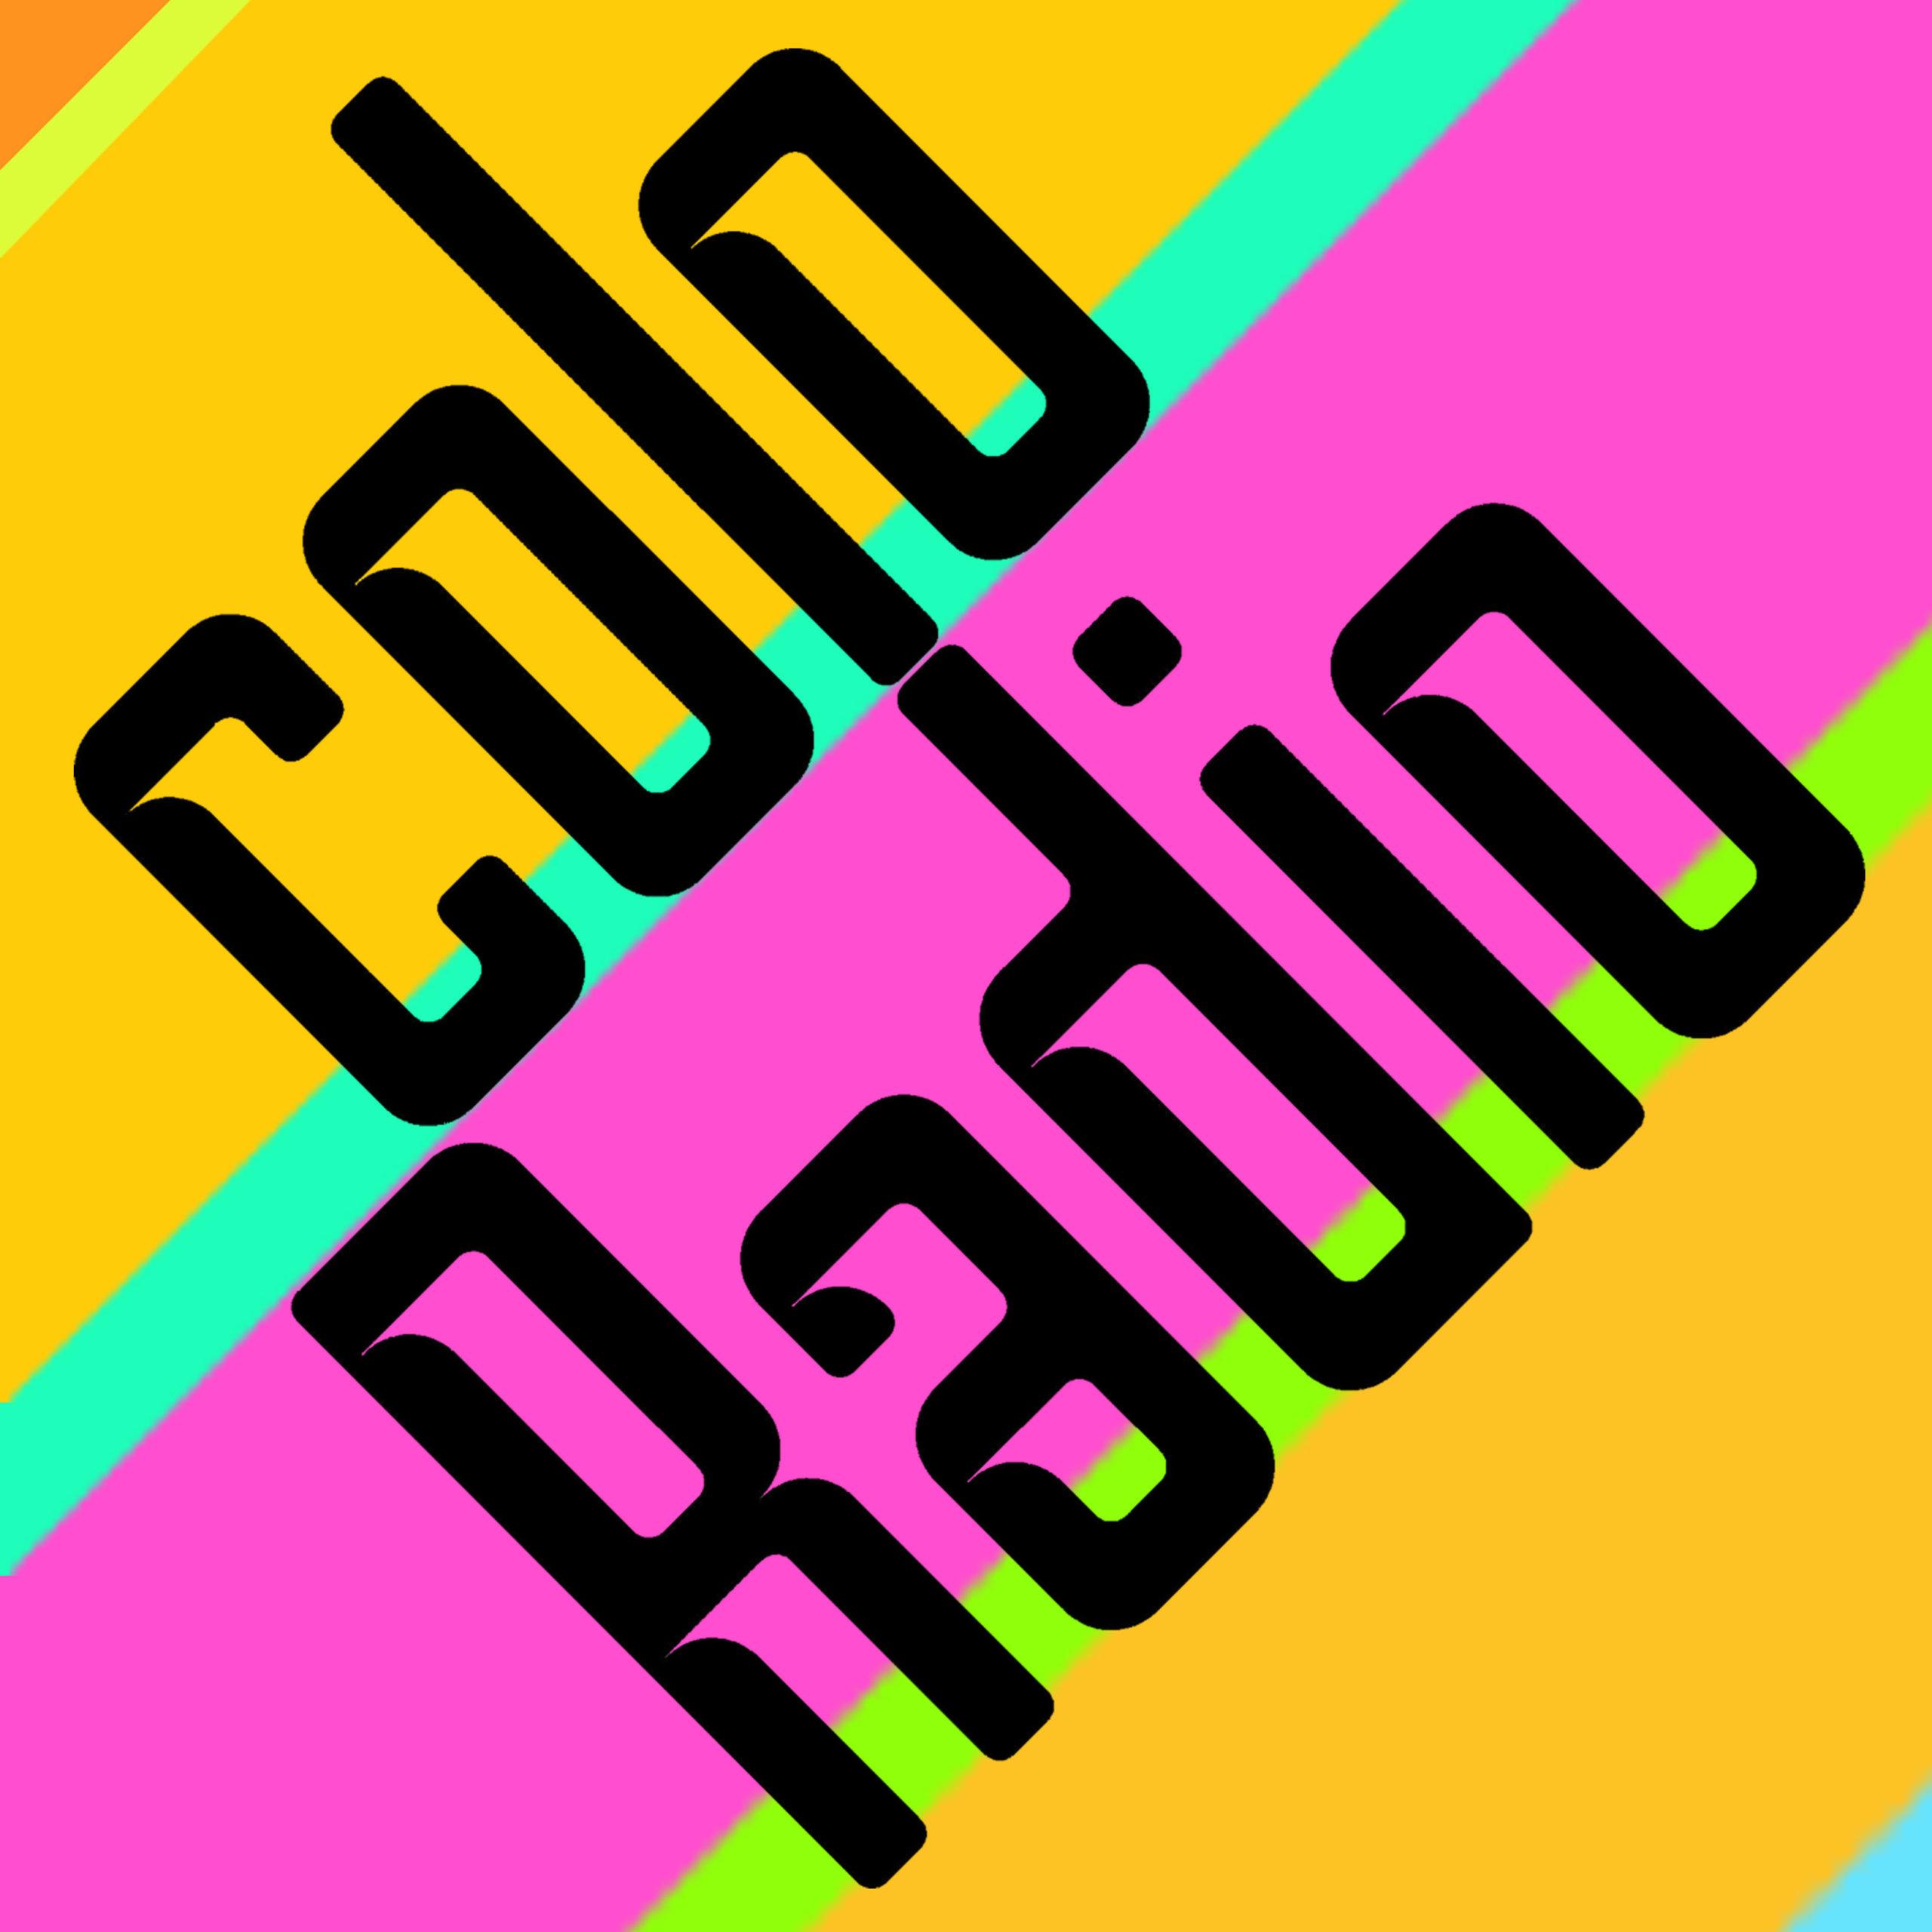 coloRadio 99,3 und 98,4 MHz